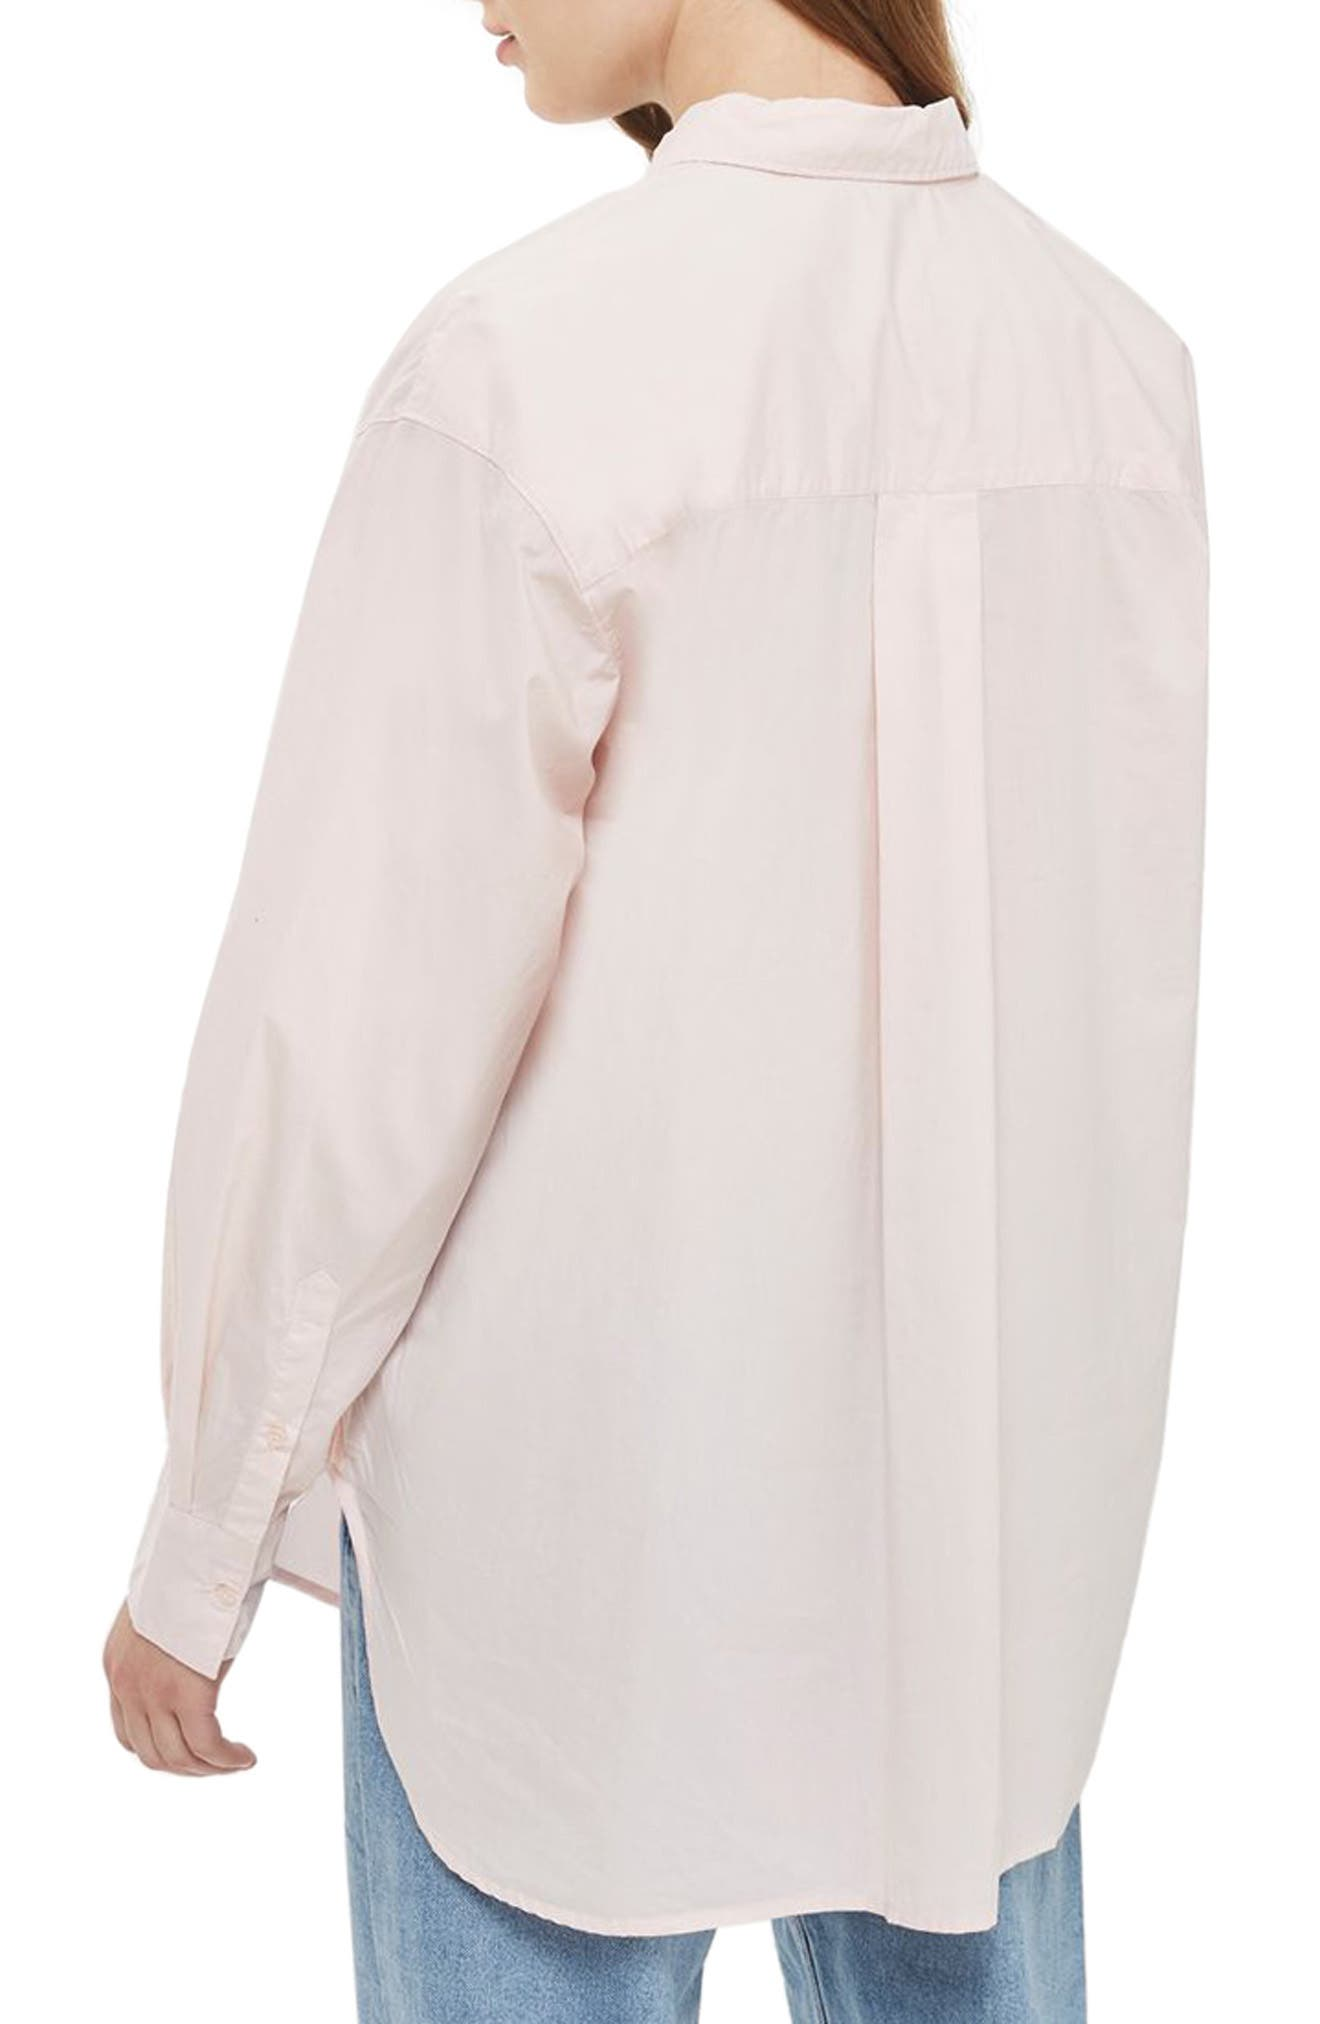 Olly Oversize Poplin Shirt,                             Alternate thumbnail 2, color,                             Light Pink